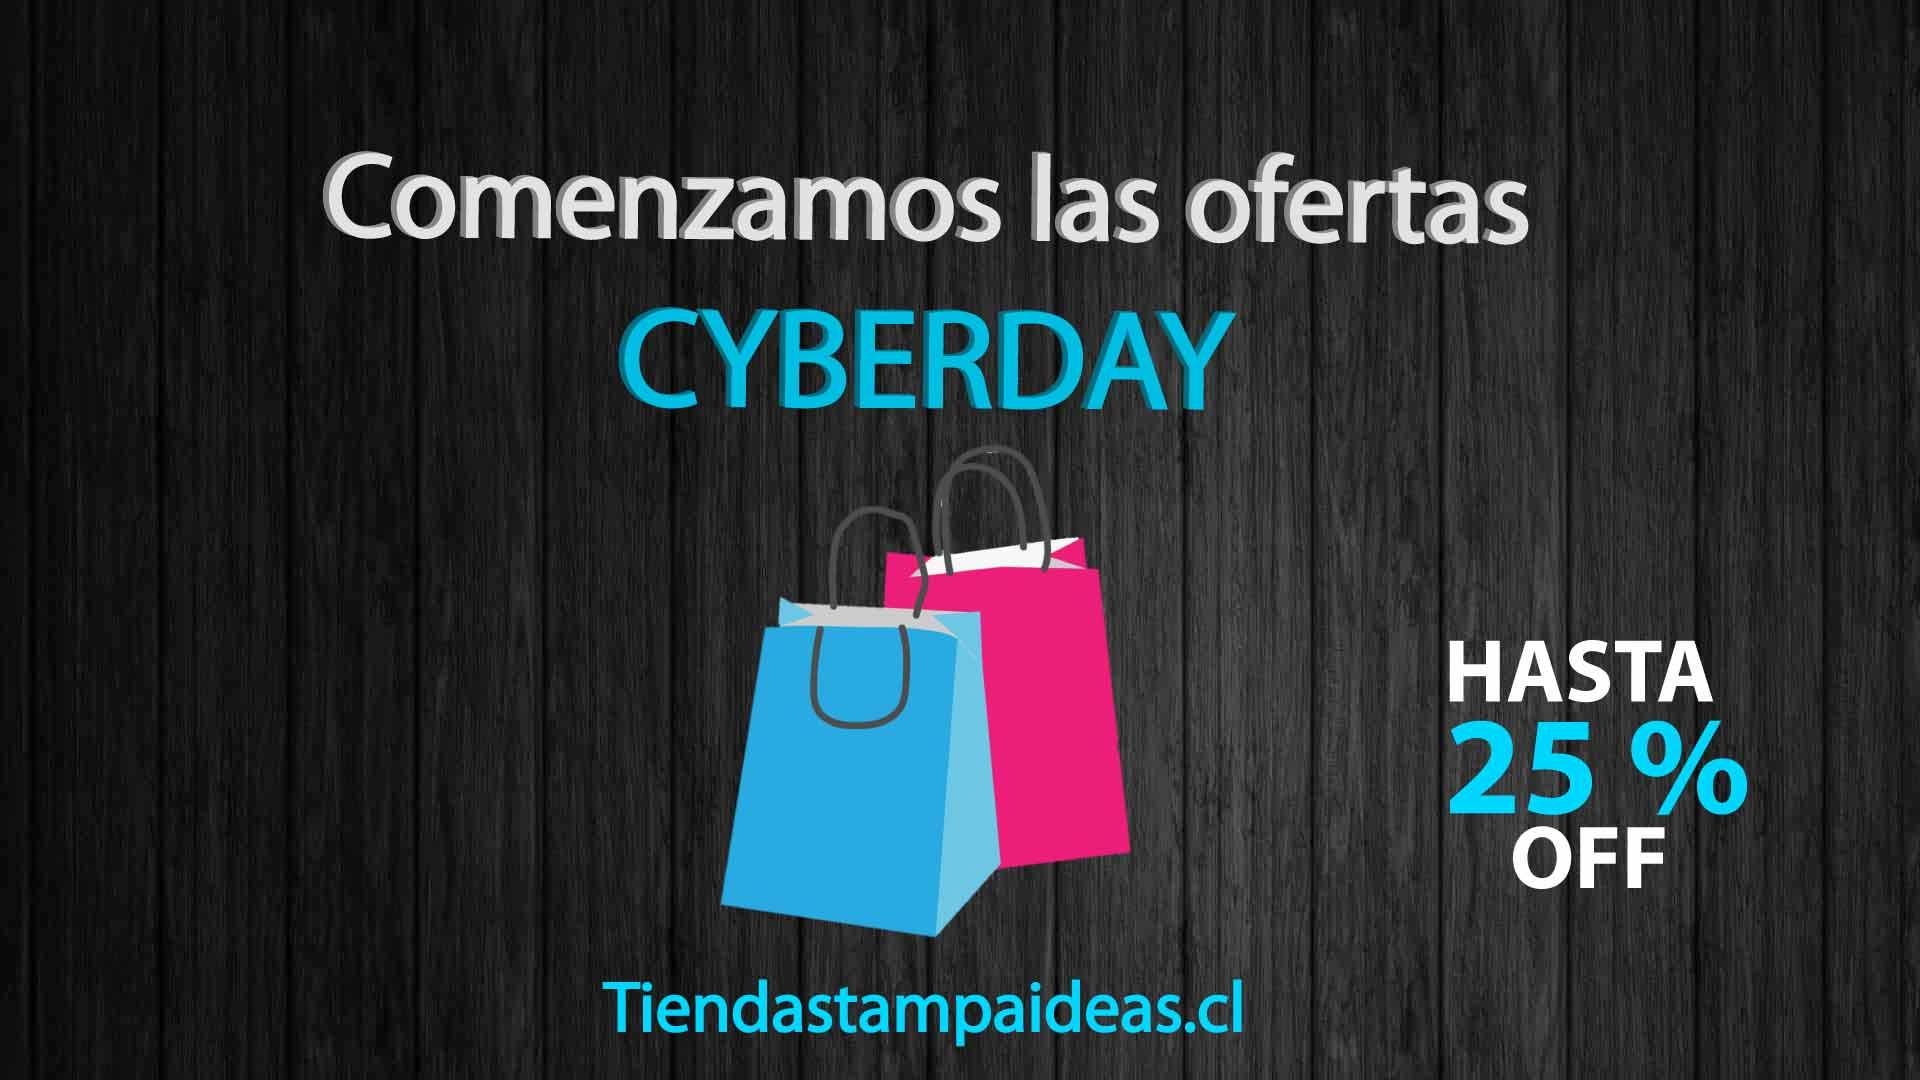 Cyberday-Stampaideas-cricut-cinch